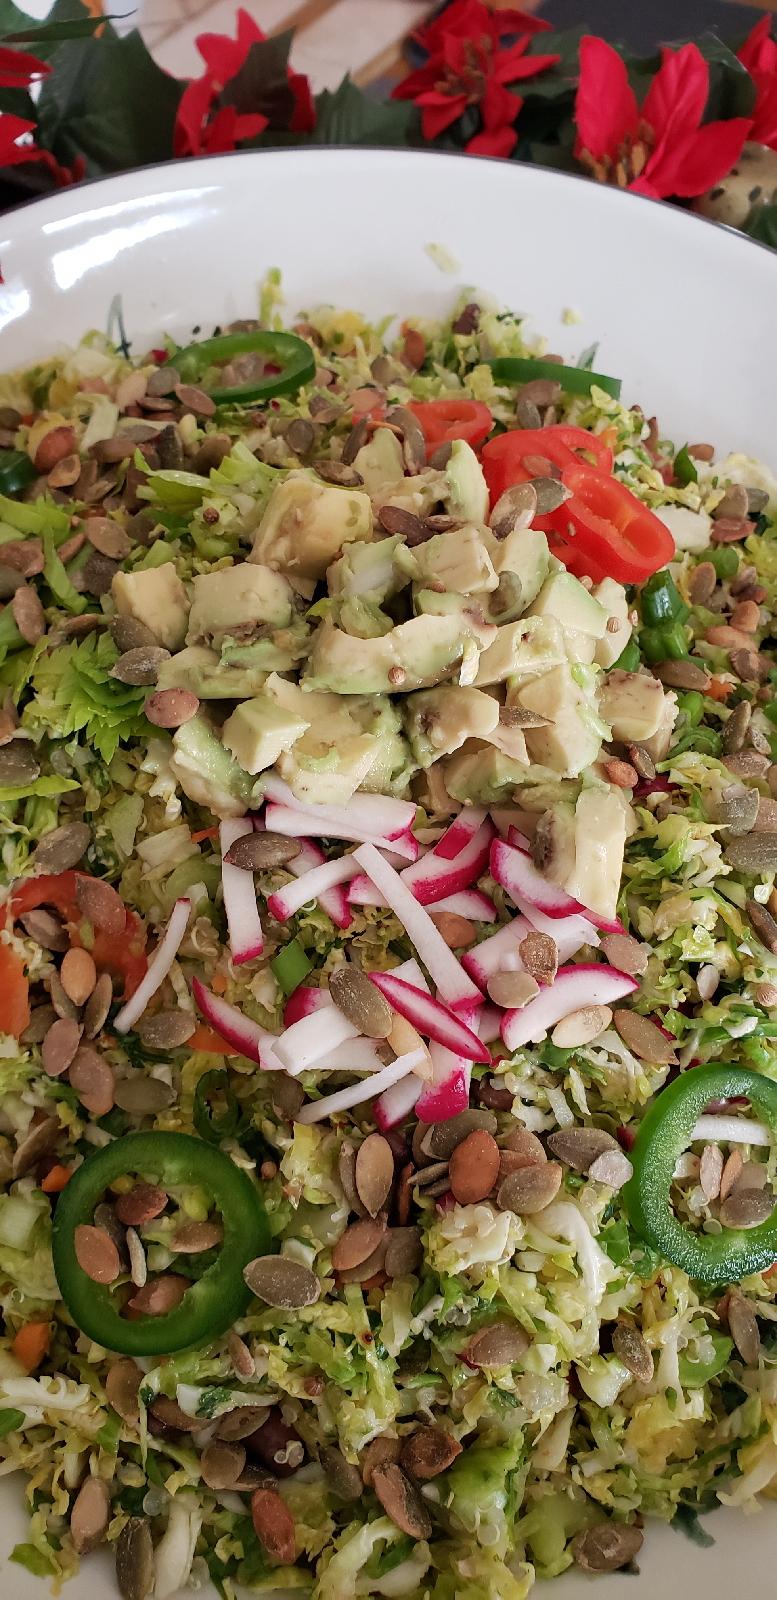 vegan, vegetarian, gluten free, recipe, holiday food, potluck, salad, meal prep, lunch